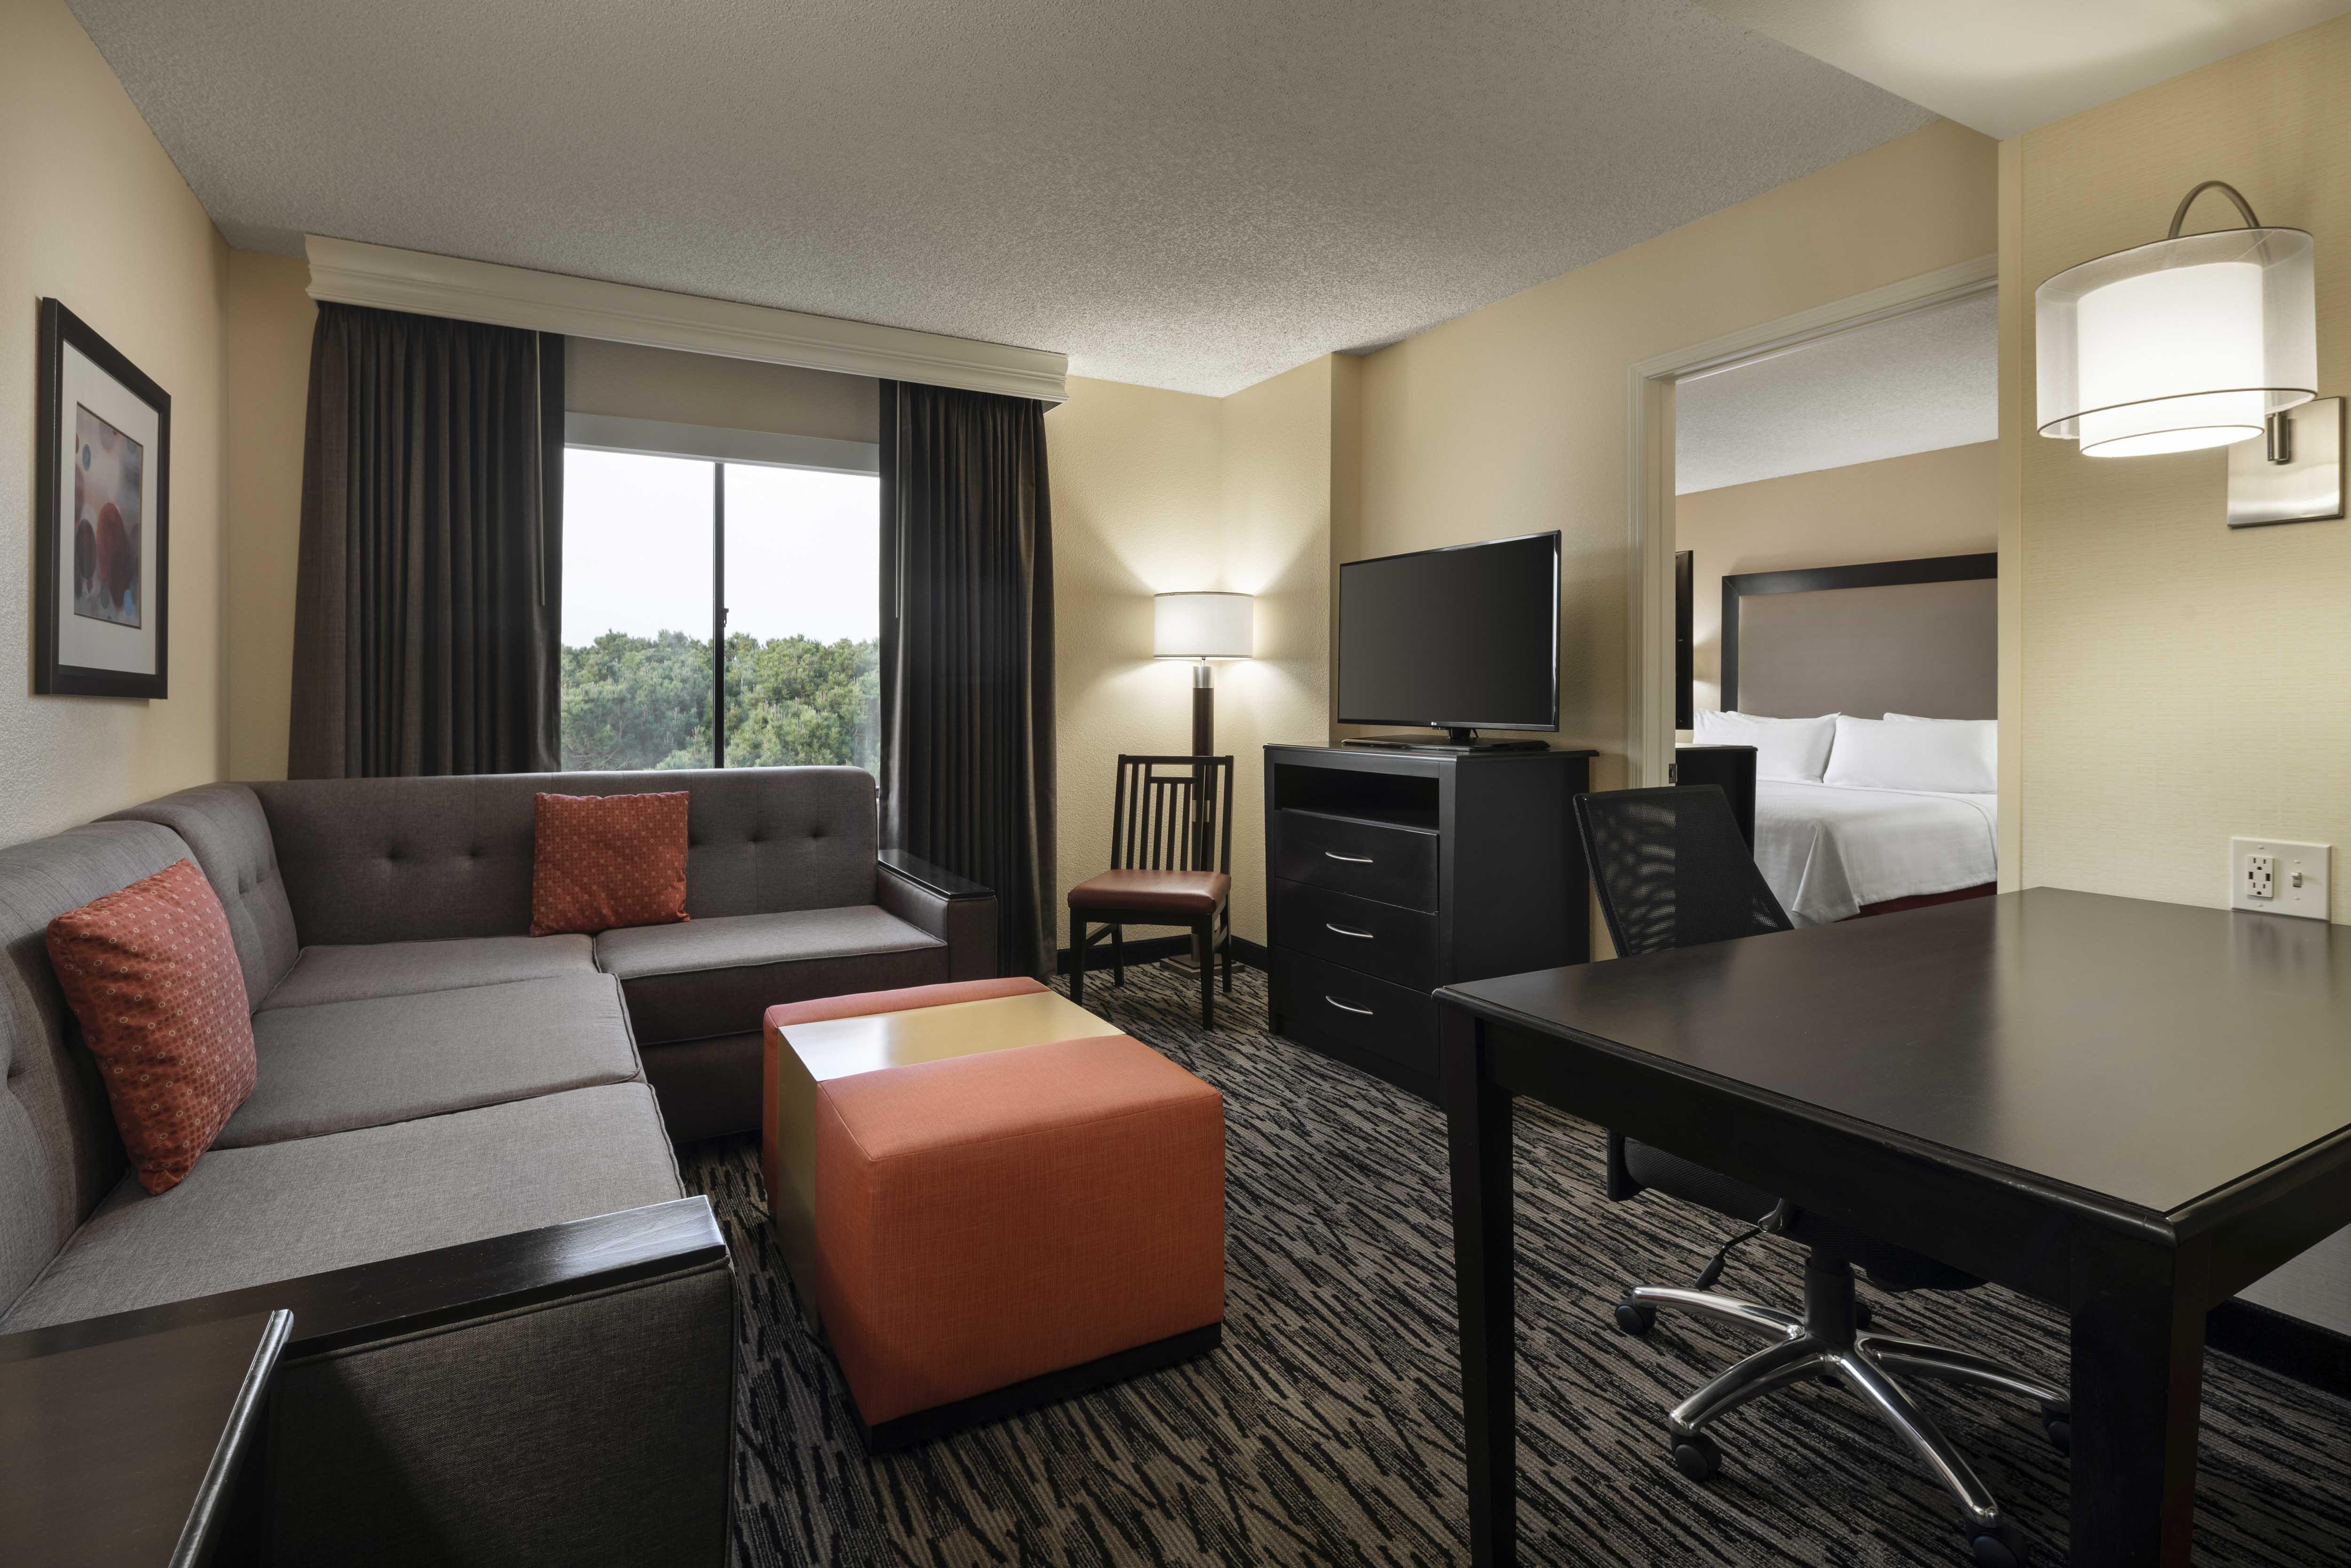 Homewood Suites By Hilton Anaheim Main Gate Area Disneyland Hotels Anaheim Hotels 1 King Bed 1 Bedroom Suite